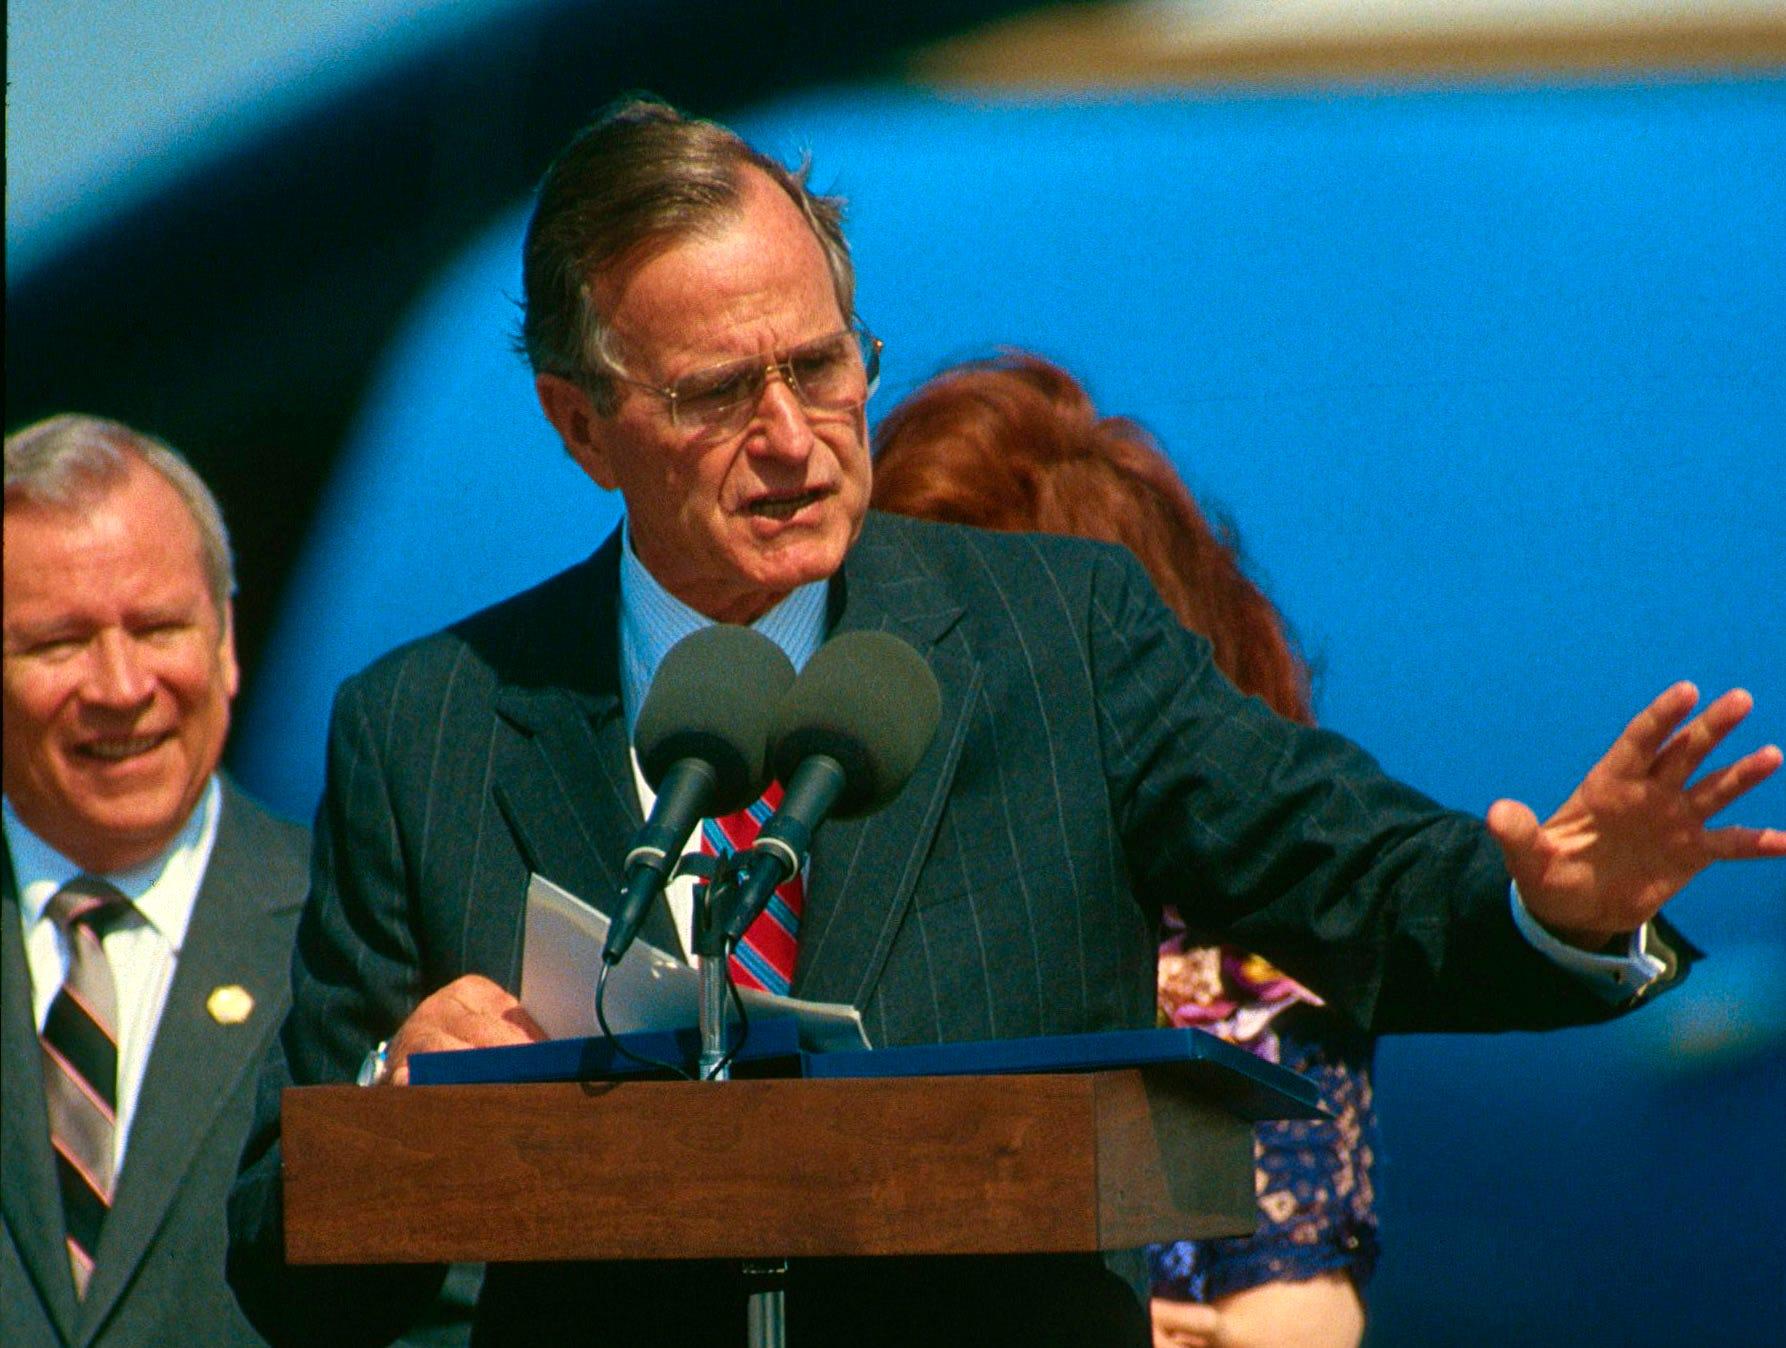 President George H.W. Bush speaks on Sept. 29, 1992, at McGhee Tyson Airport. Former U.S. Sen. Howard H. Baker Jr. is at left.